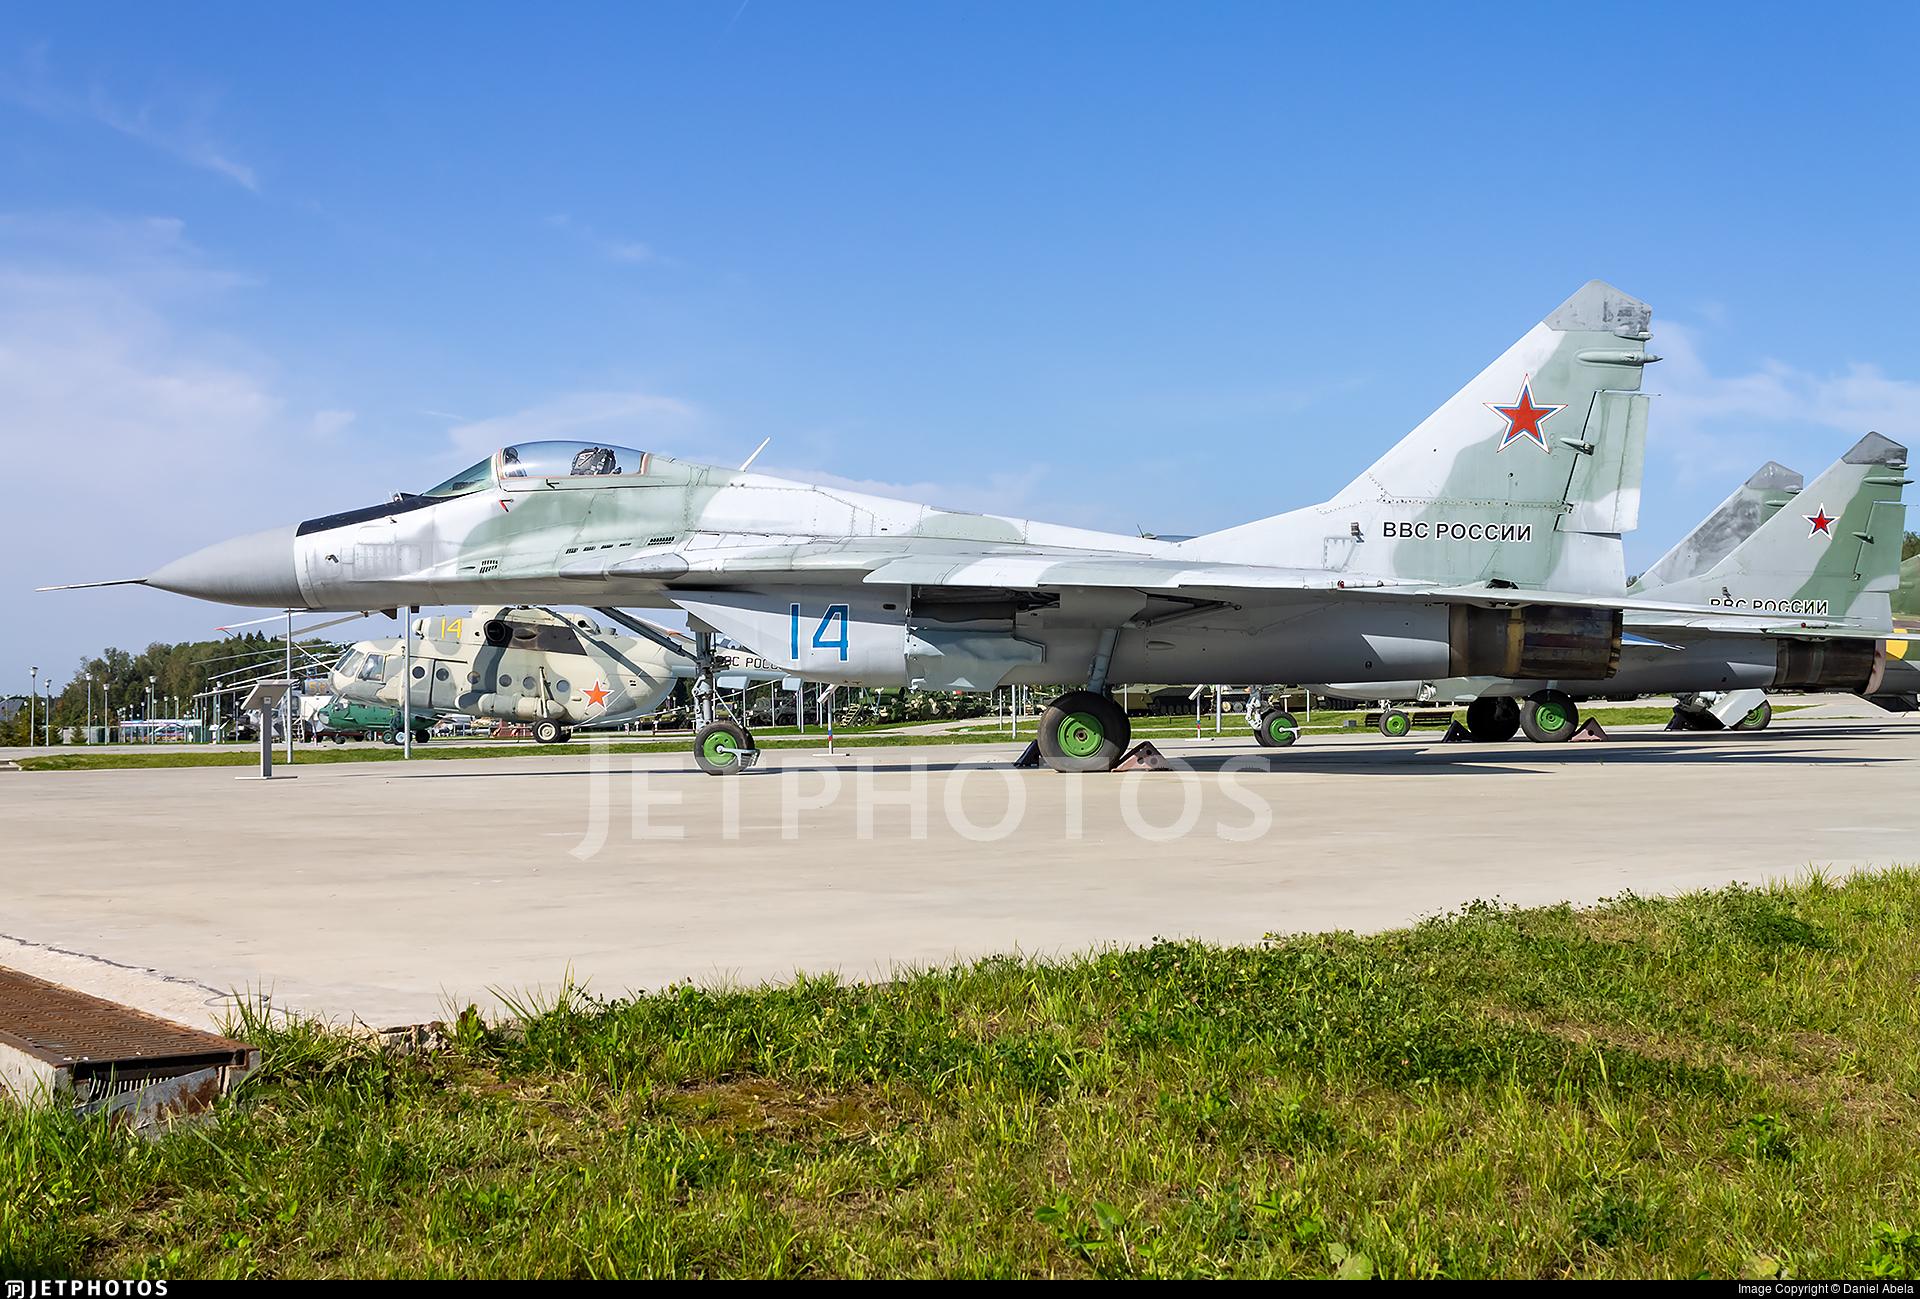 14 - Mikoyan-Gurevich MiG-29A Fulcrum - Russia - Air Force